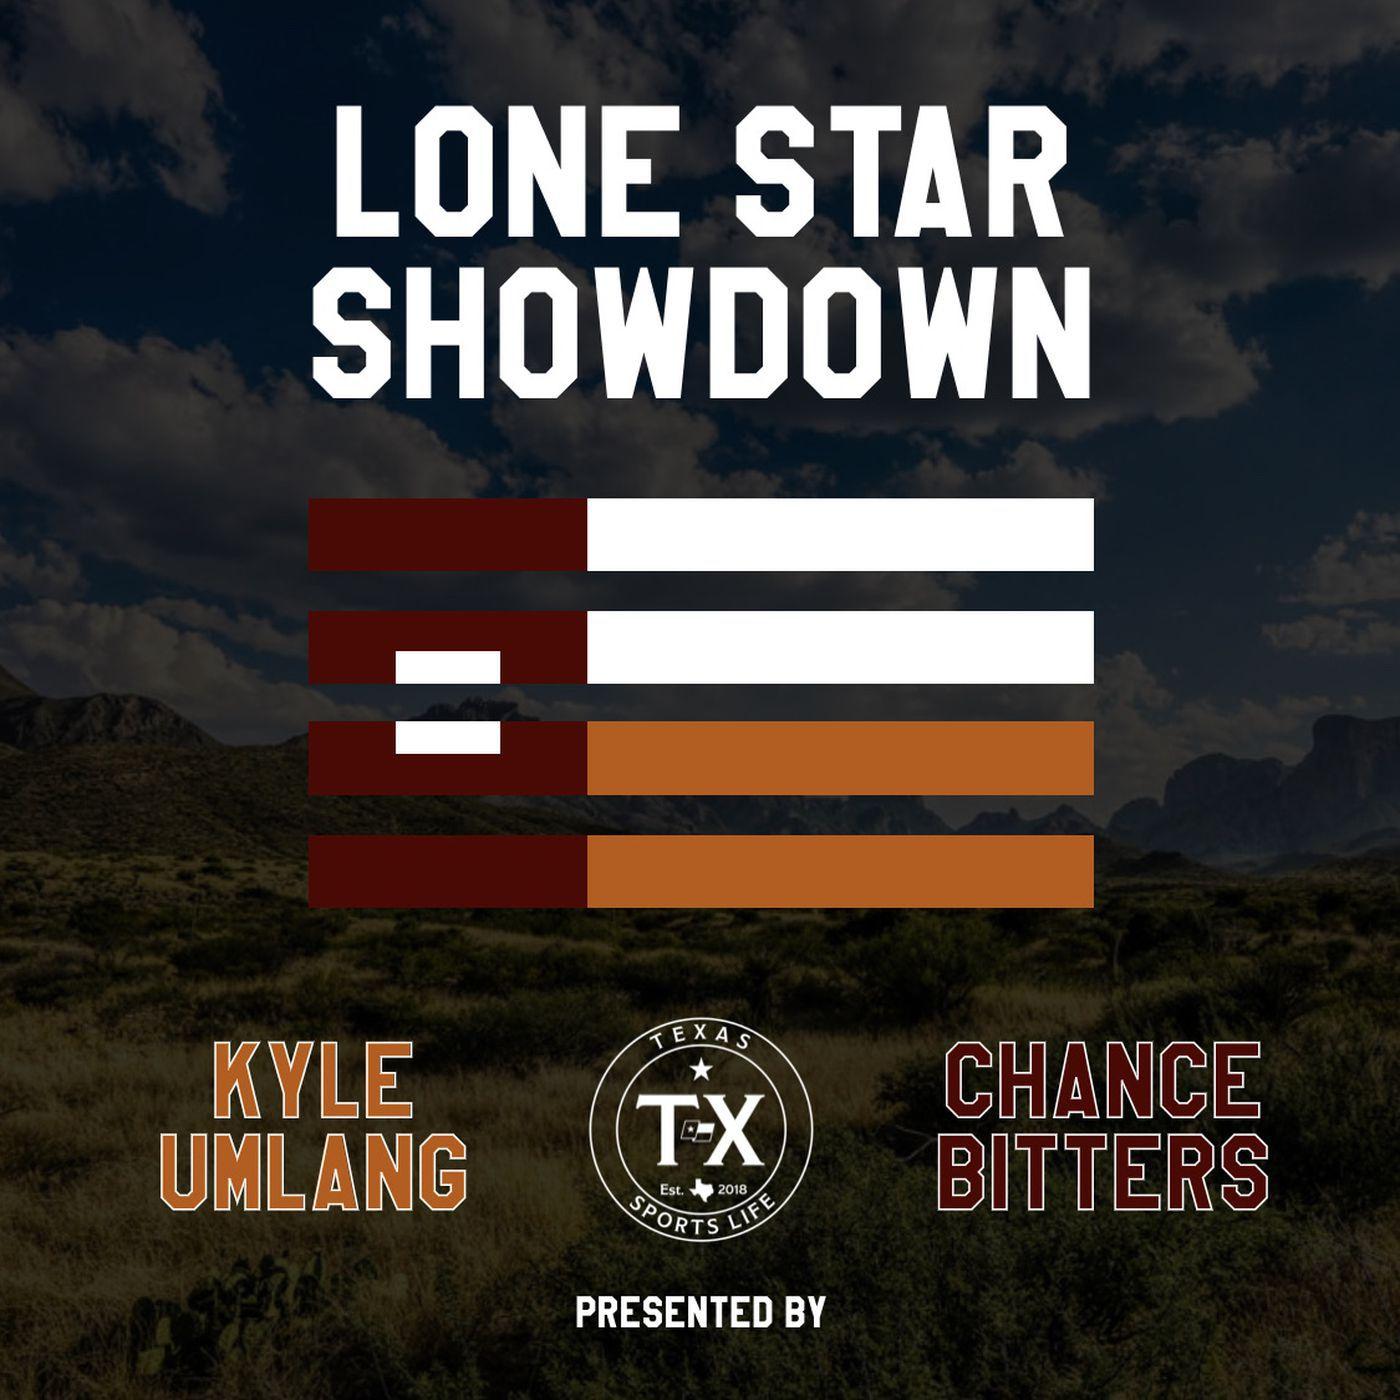 Lone Star Showdown